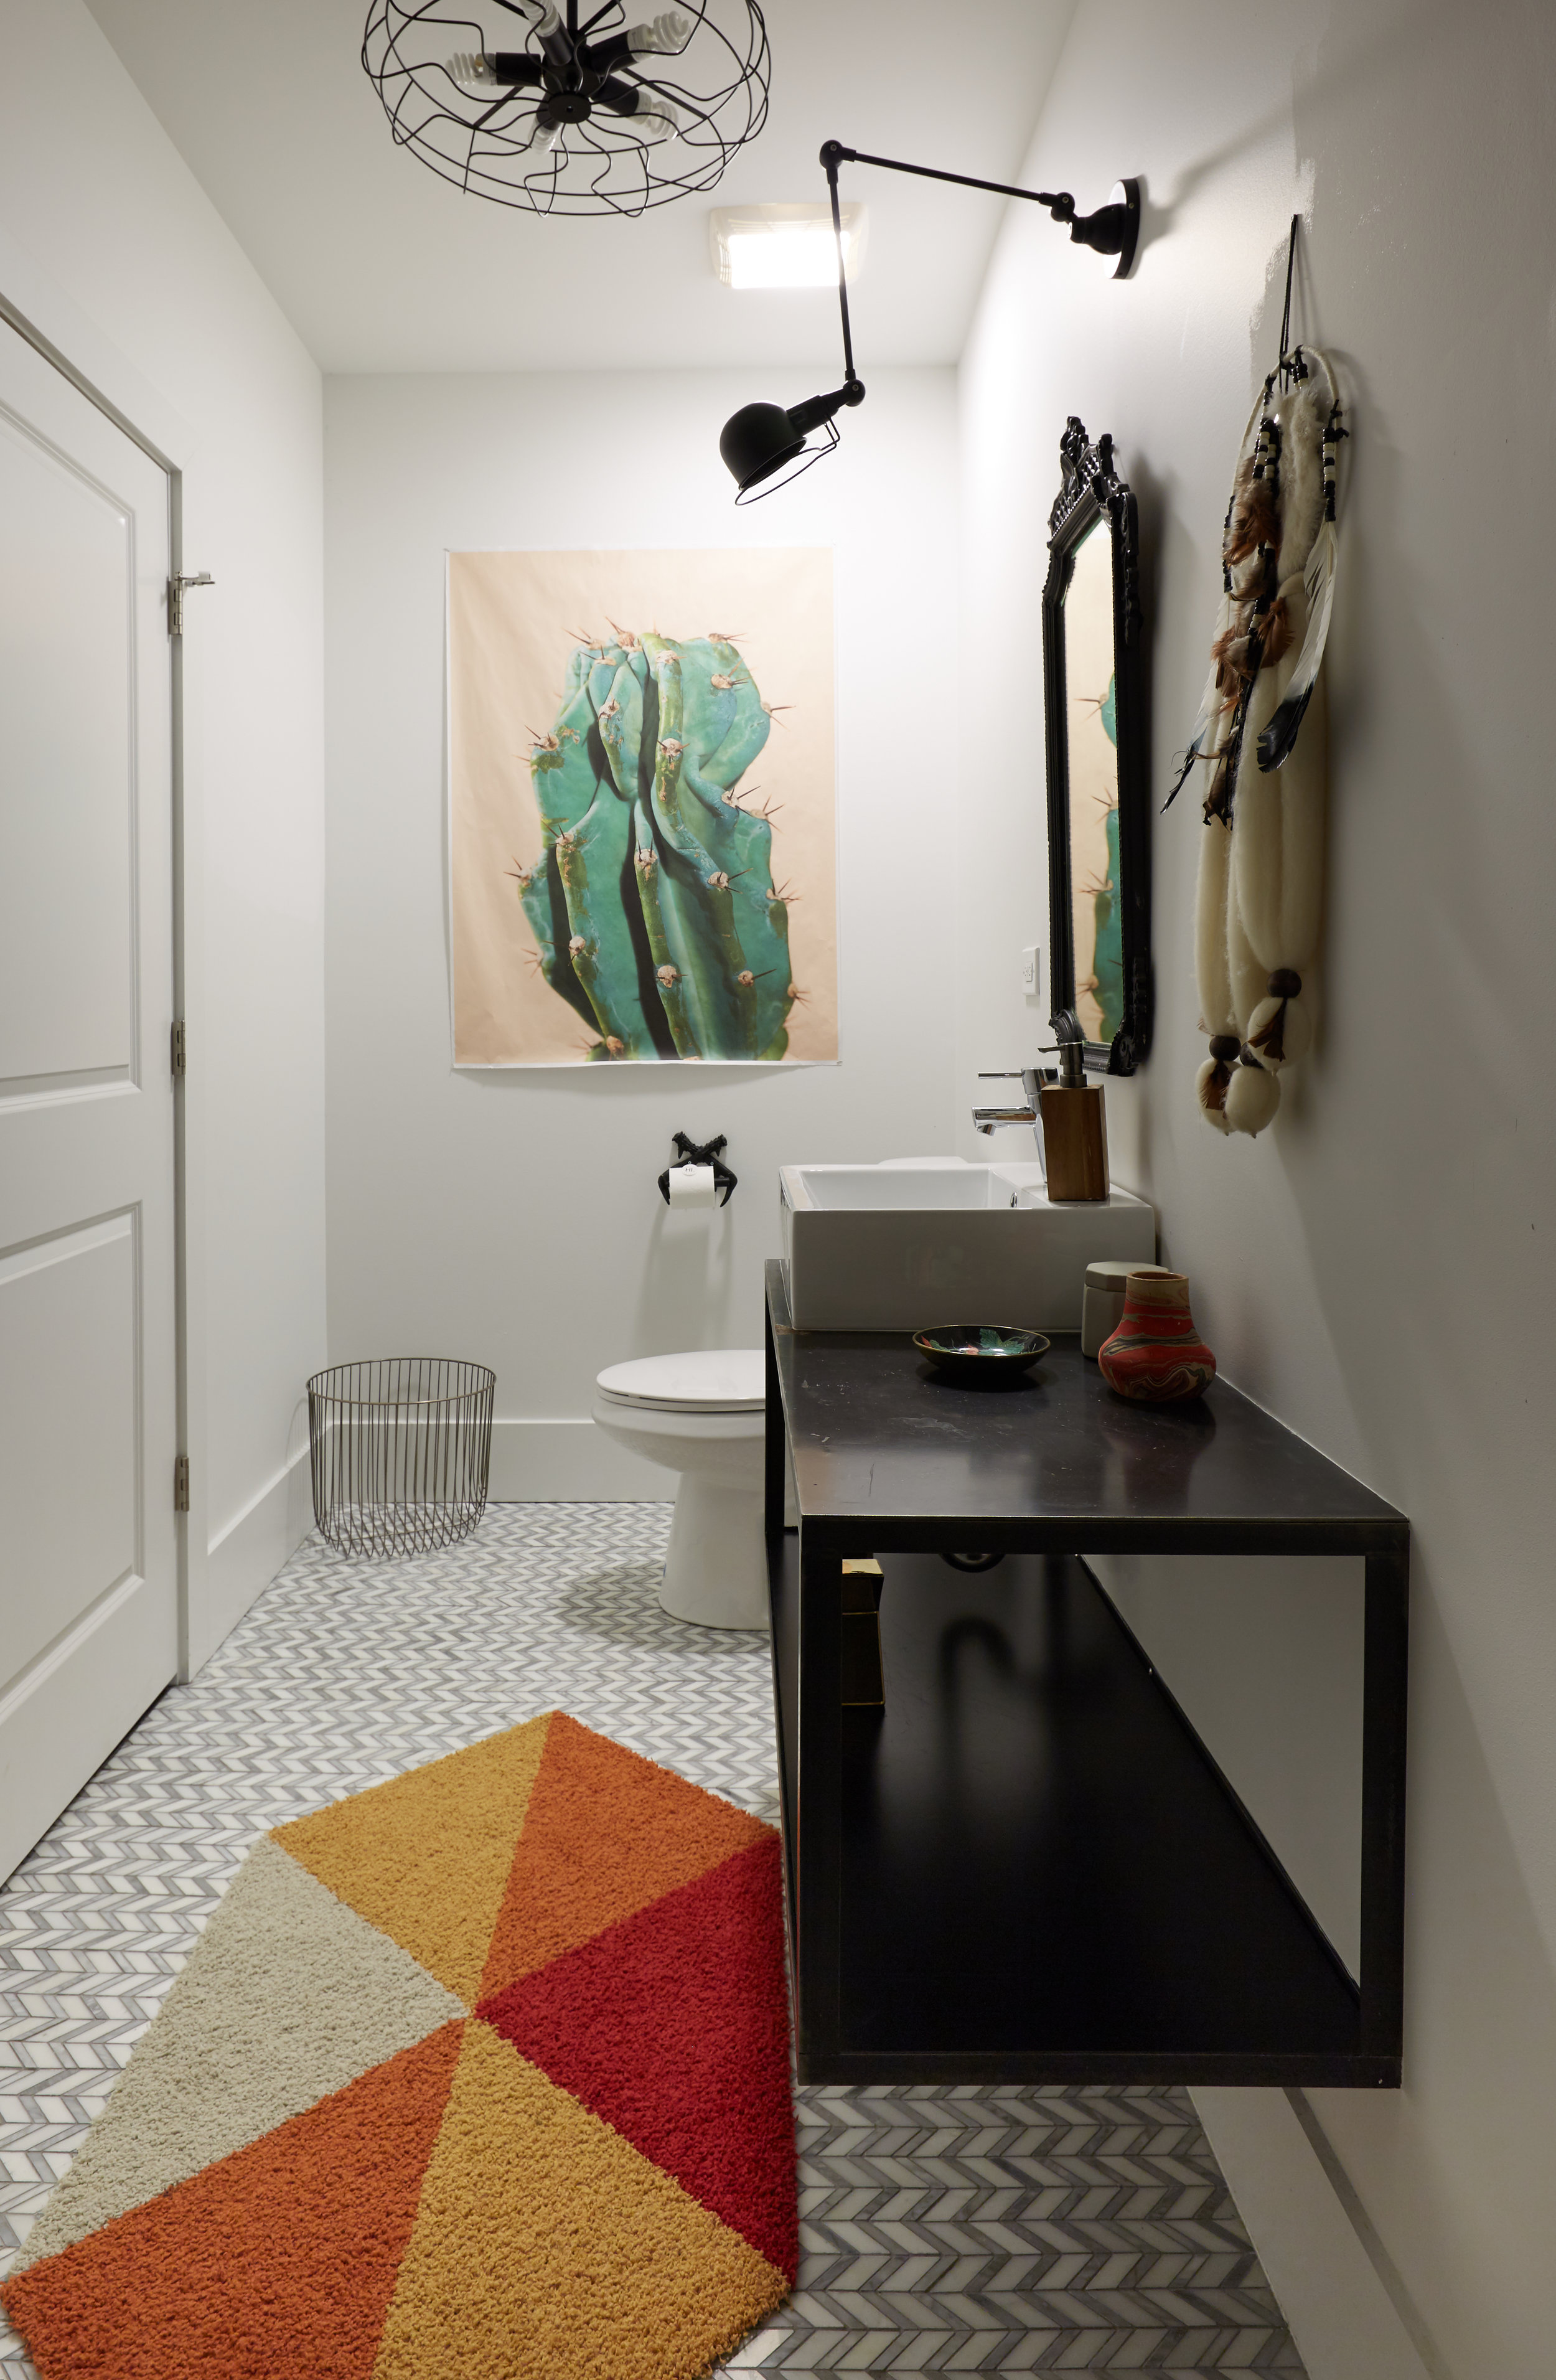 El_Motel_Bathroom_900.jpg